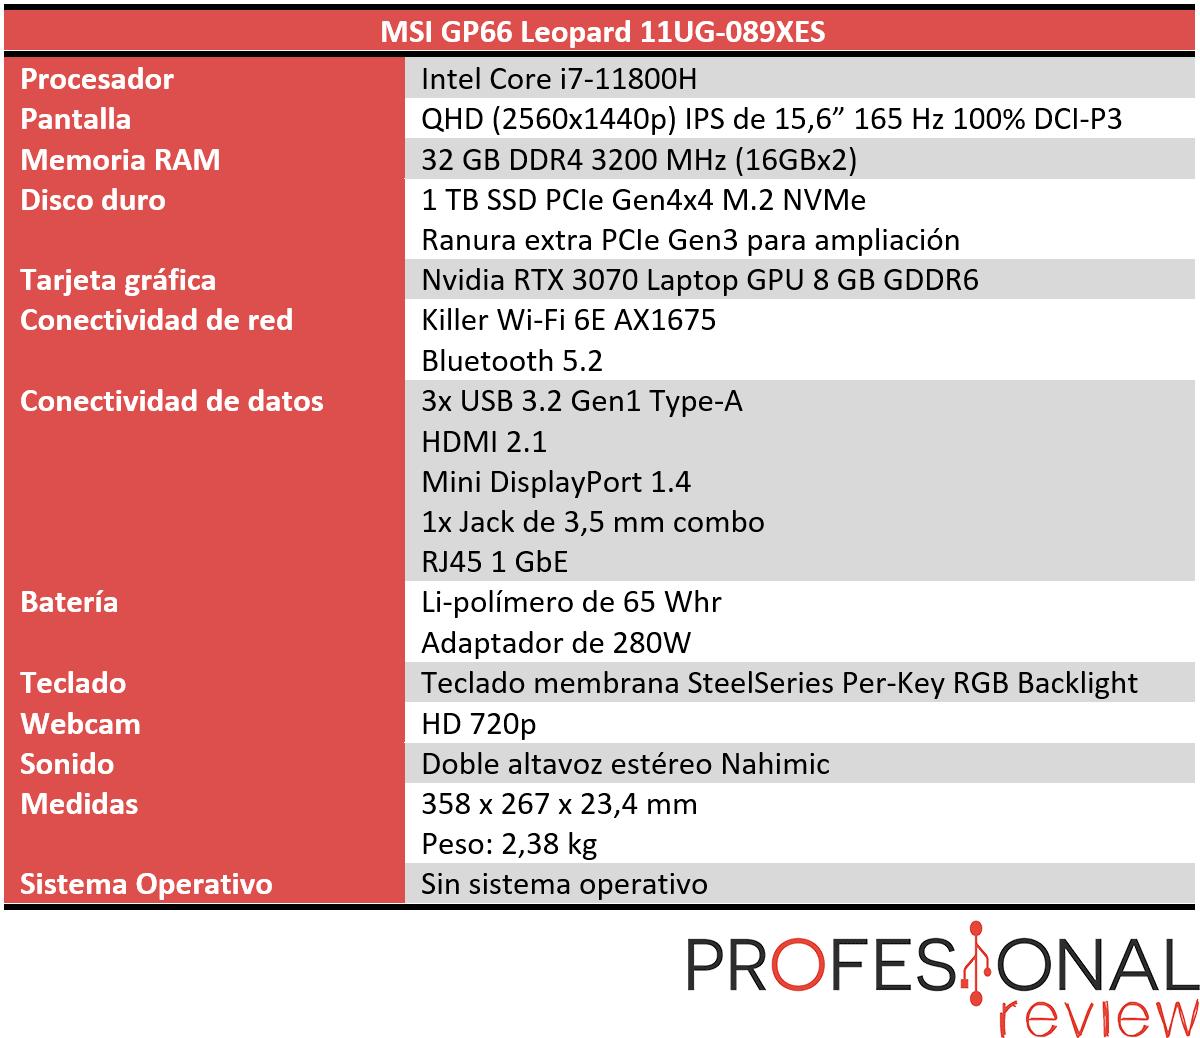 MSI GP66 Leopard 11UG Características